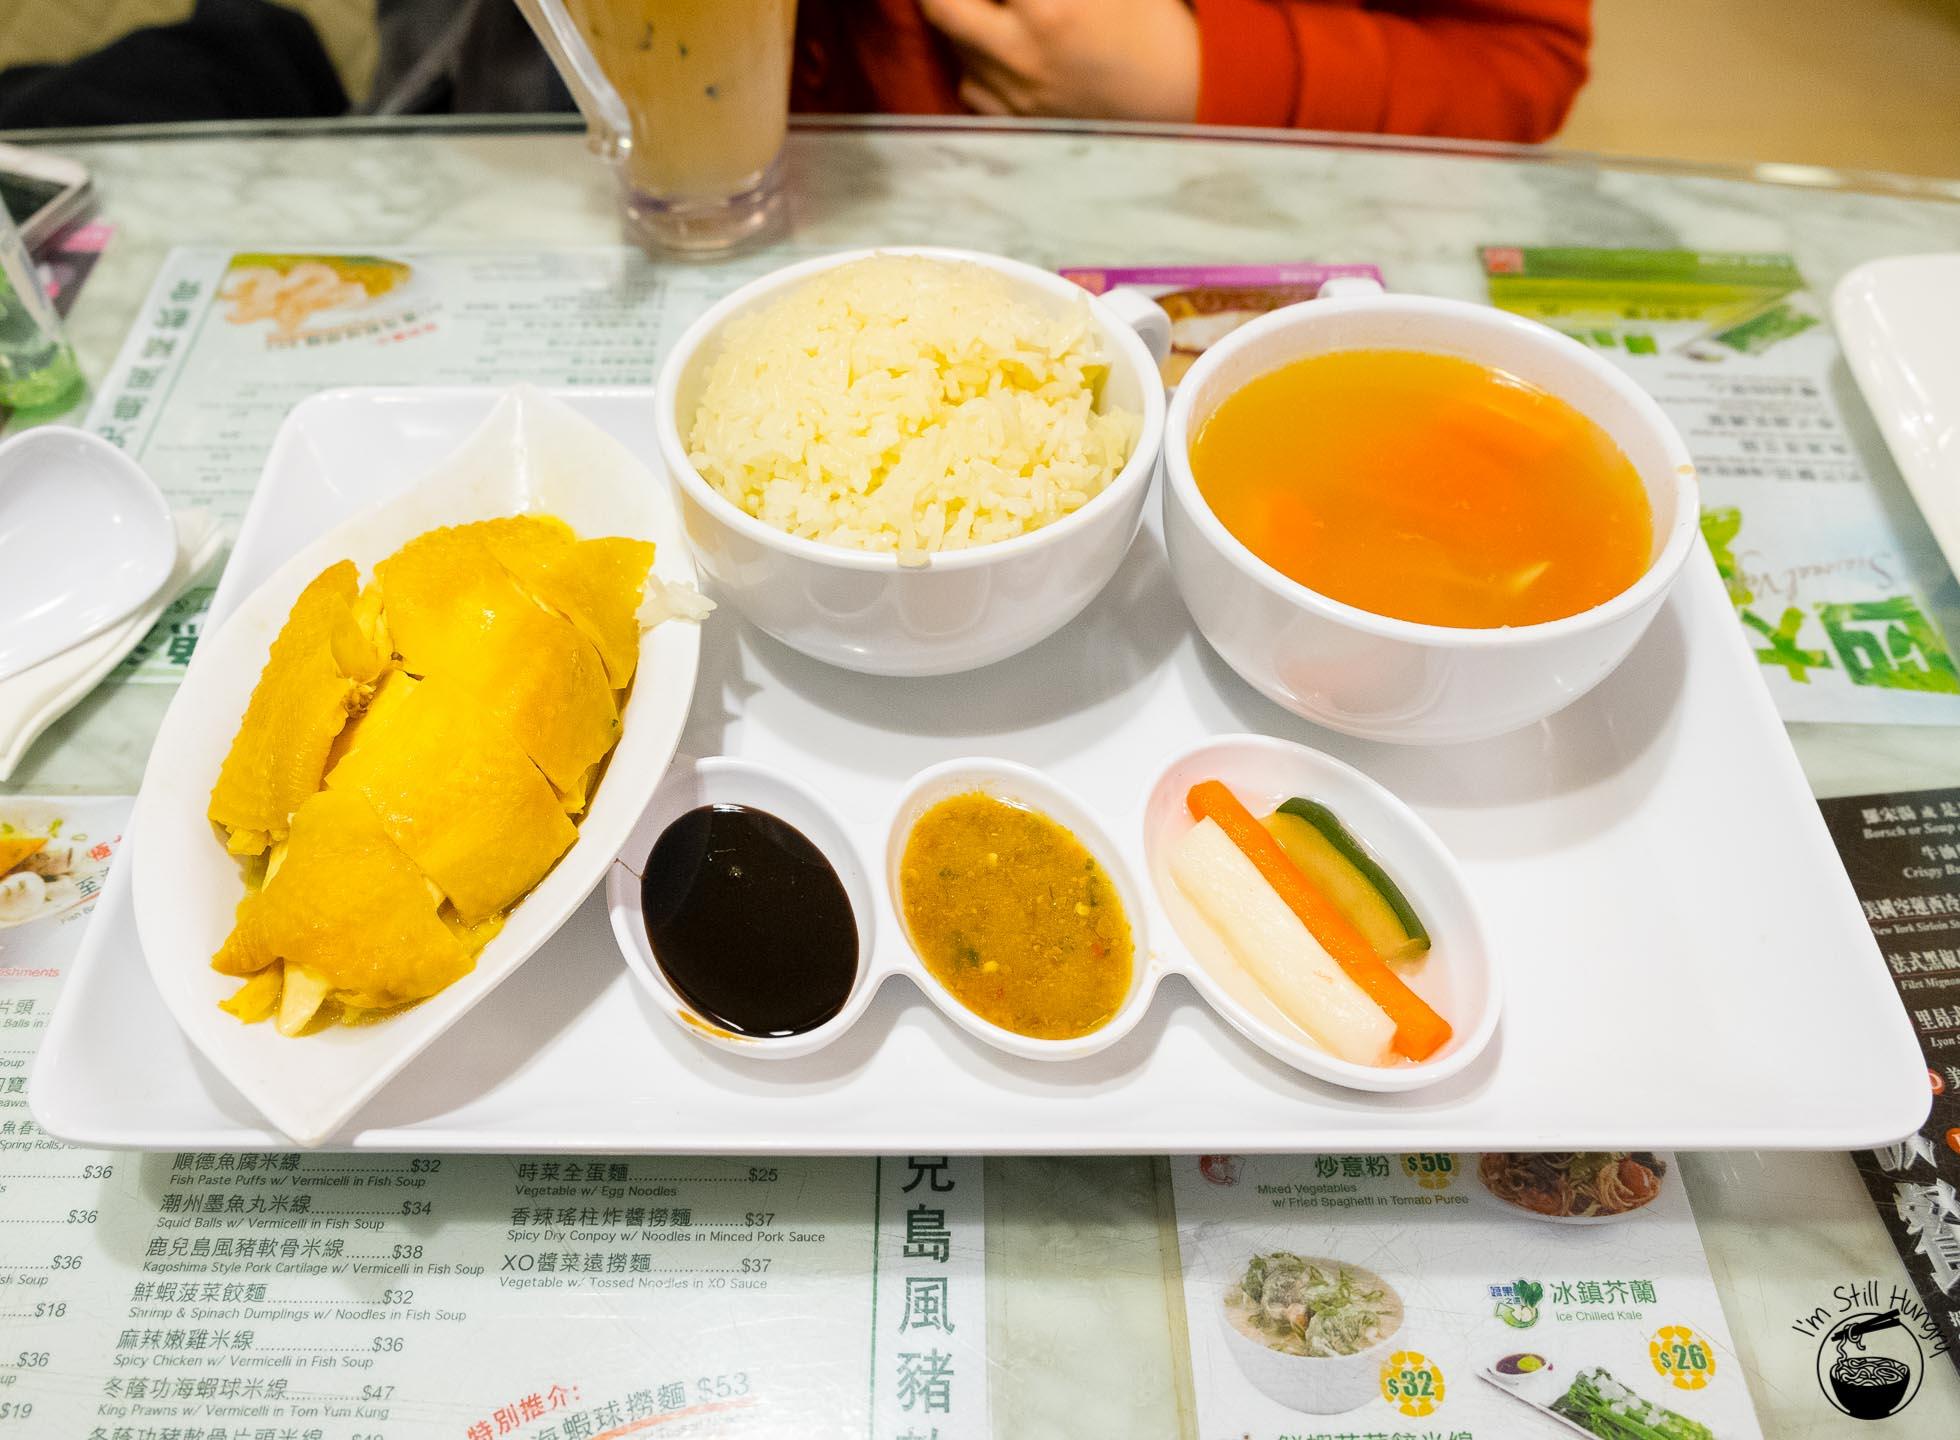 Tsui Wah Hong Kong Hainan chicken rice set...you can give this one a pass